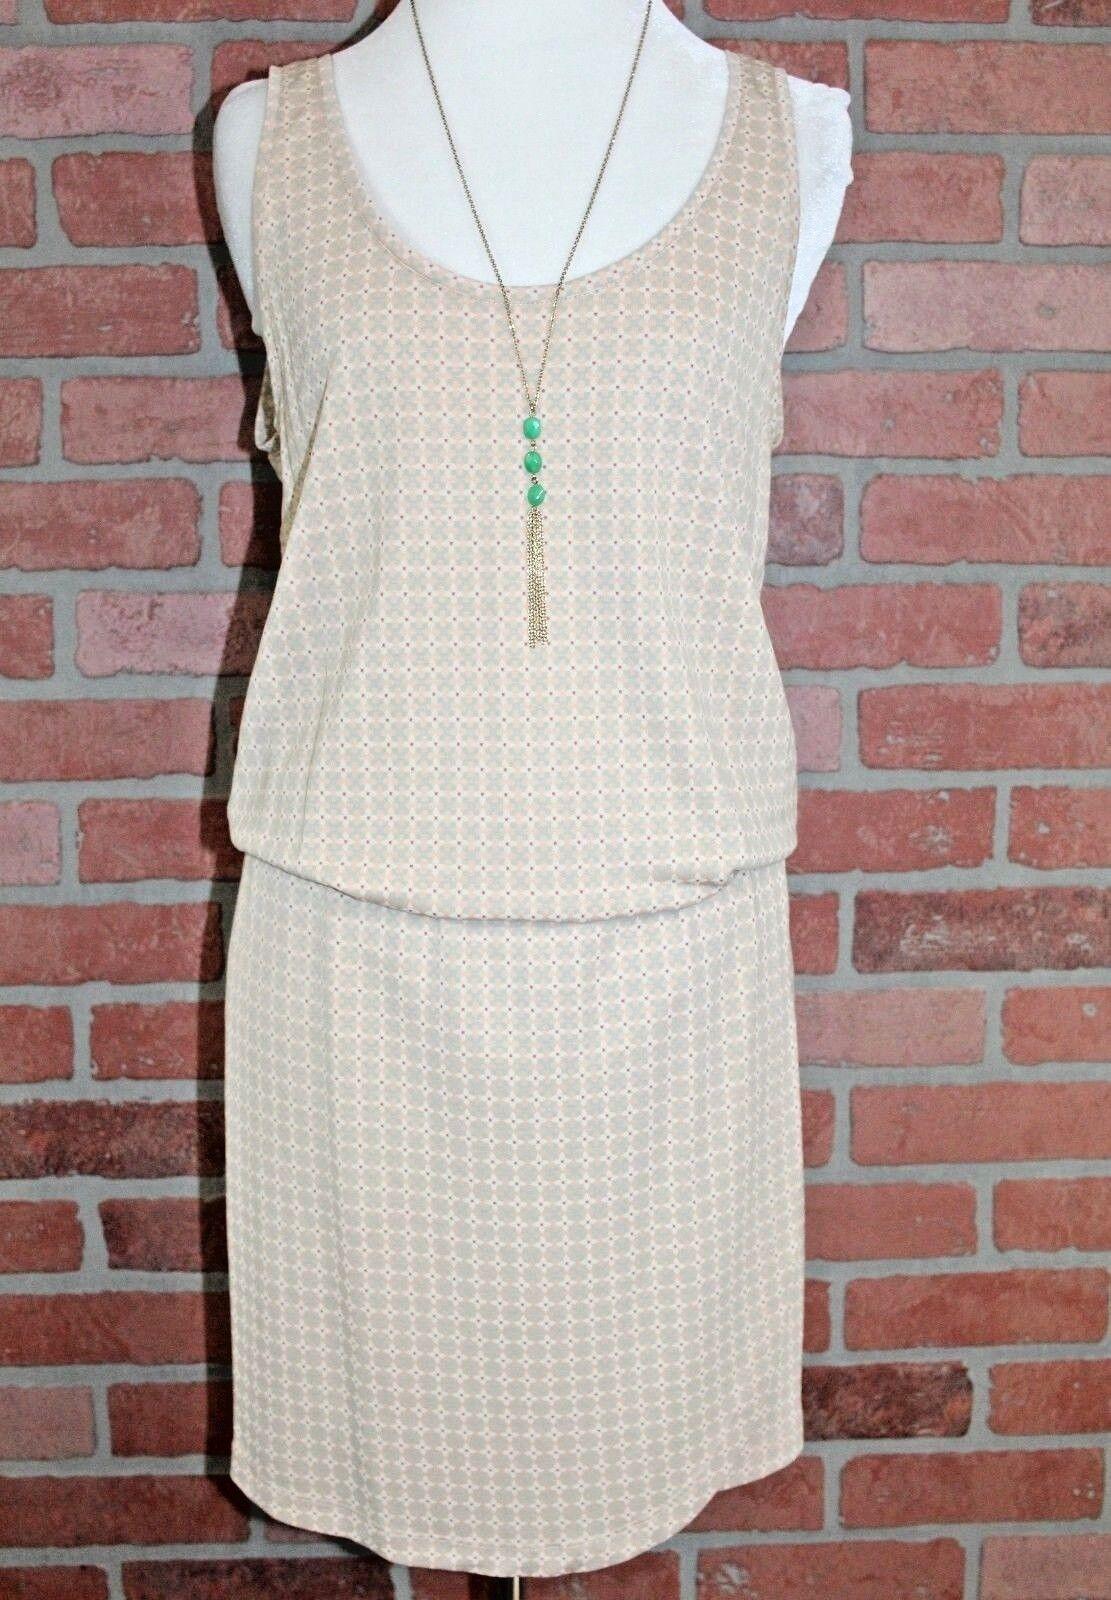 64ad0be2 ByTiMo Beige Stretchy Stretchy Stretchy Drop Waist Dress Tulip Hem Size  Small 09e425